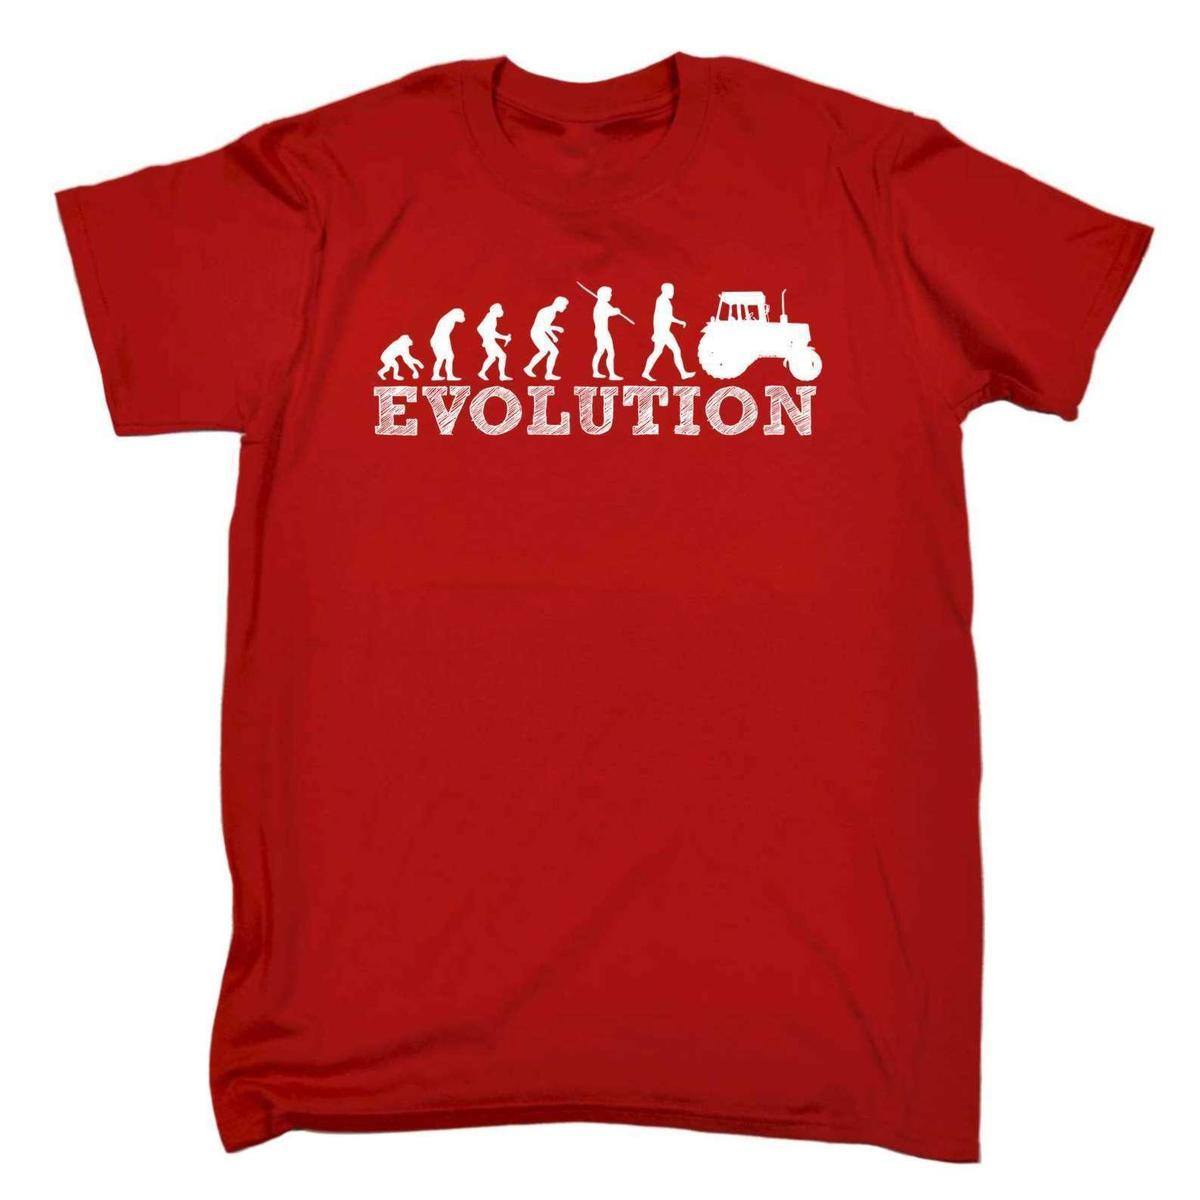 e24fac58 123t Men'S Evolution Tractor Farm Farmer Farming Funny Joke T SHIRT Cool T  Shirt Sites White Designer T Shirts From Lijian18, $12.08| DHgate.Com